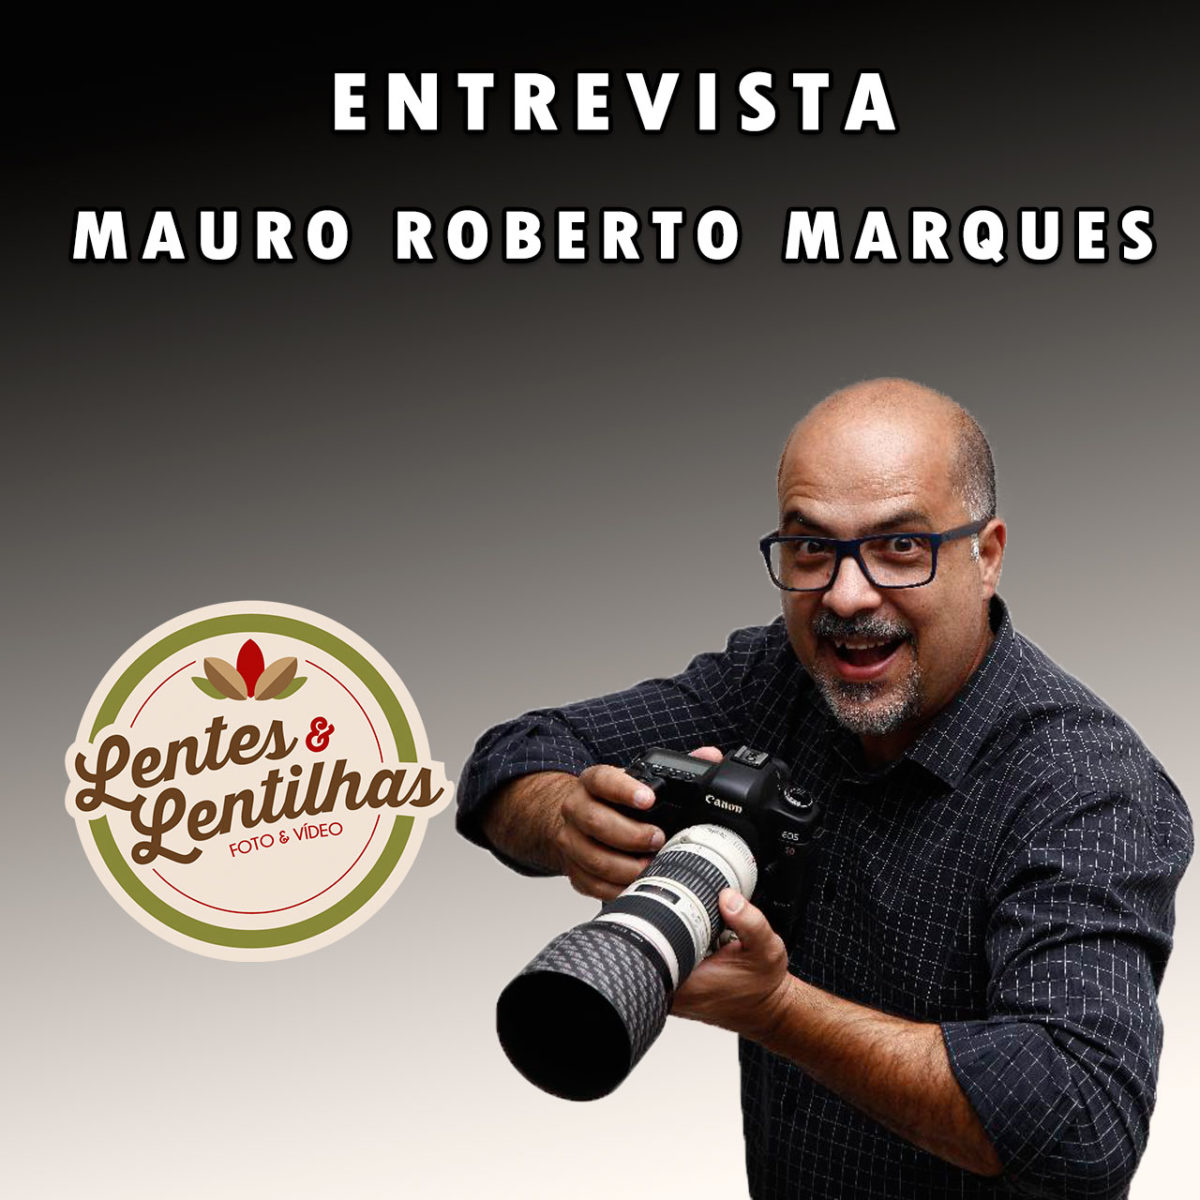 Entrevista Mauro Roberto Marques – O Fotorista Podcast #005